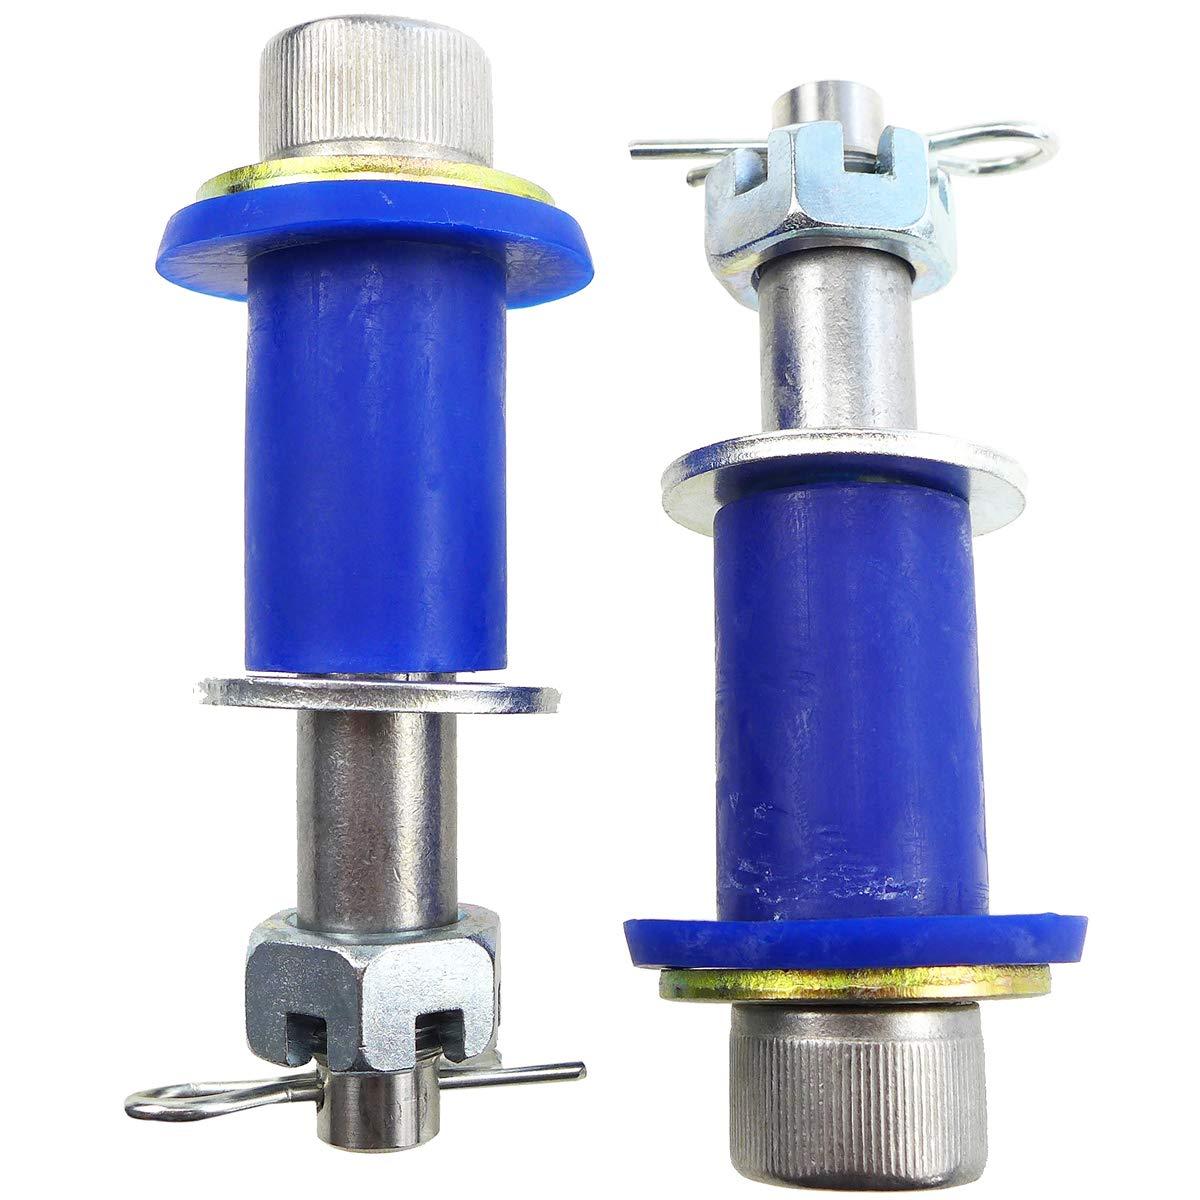 TIKSCIENCE Engine Hood Hinge Pivot Bolt Bushing Kit Fit for Peterbilt 378 379 Universal Replace 23-15273 13-04726 13-04727 Alternators Starters Plastic Iron Accessories